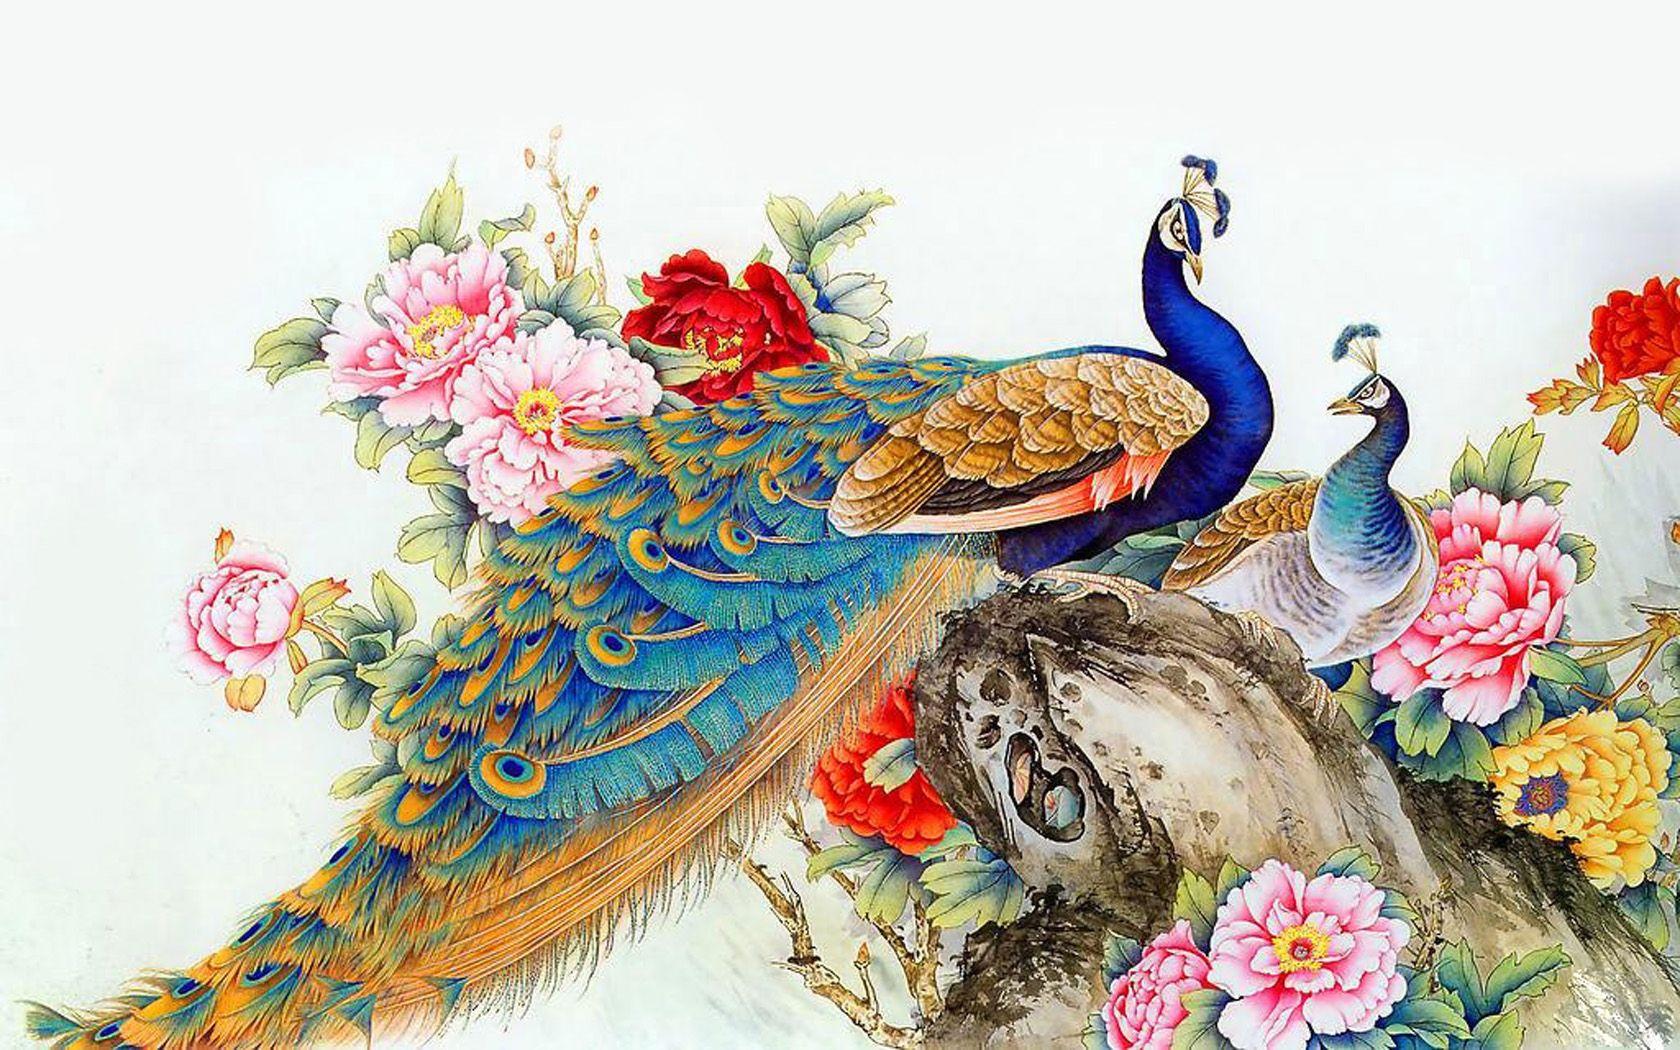 Peacock wallpaper widescreen 123 Pinterest Peacocks